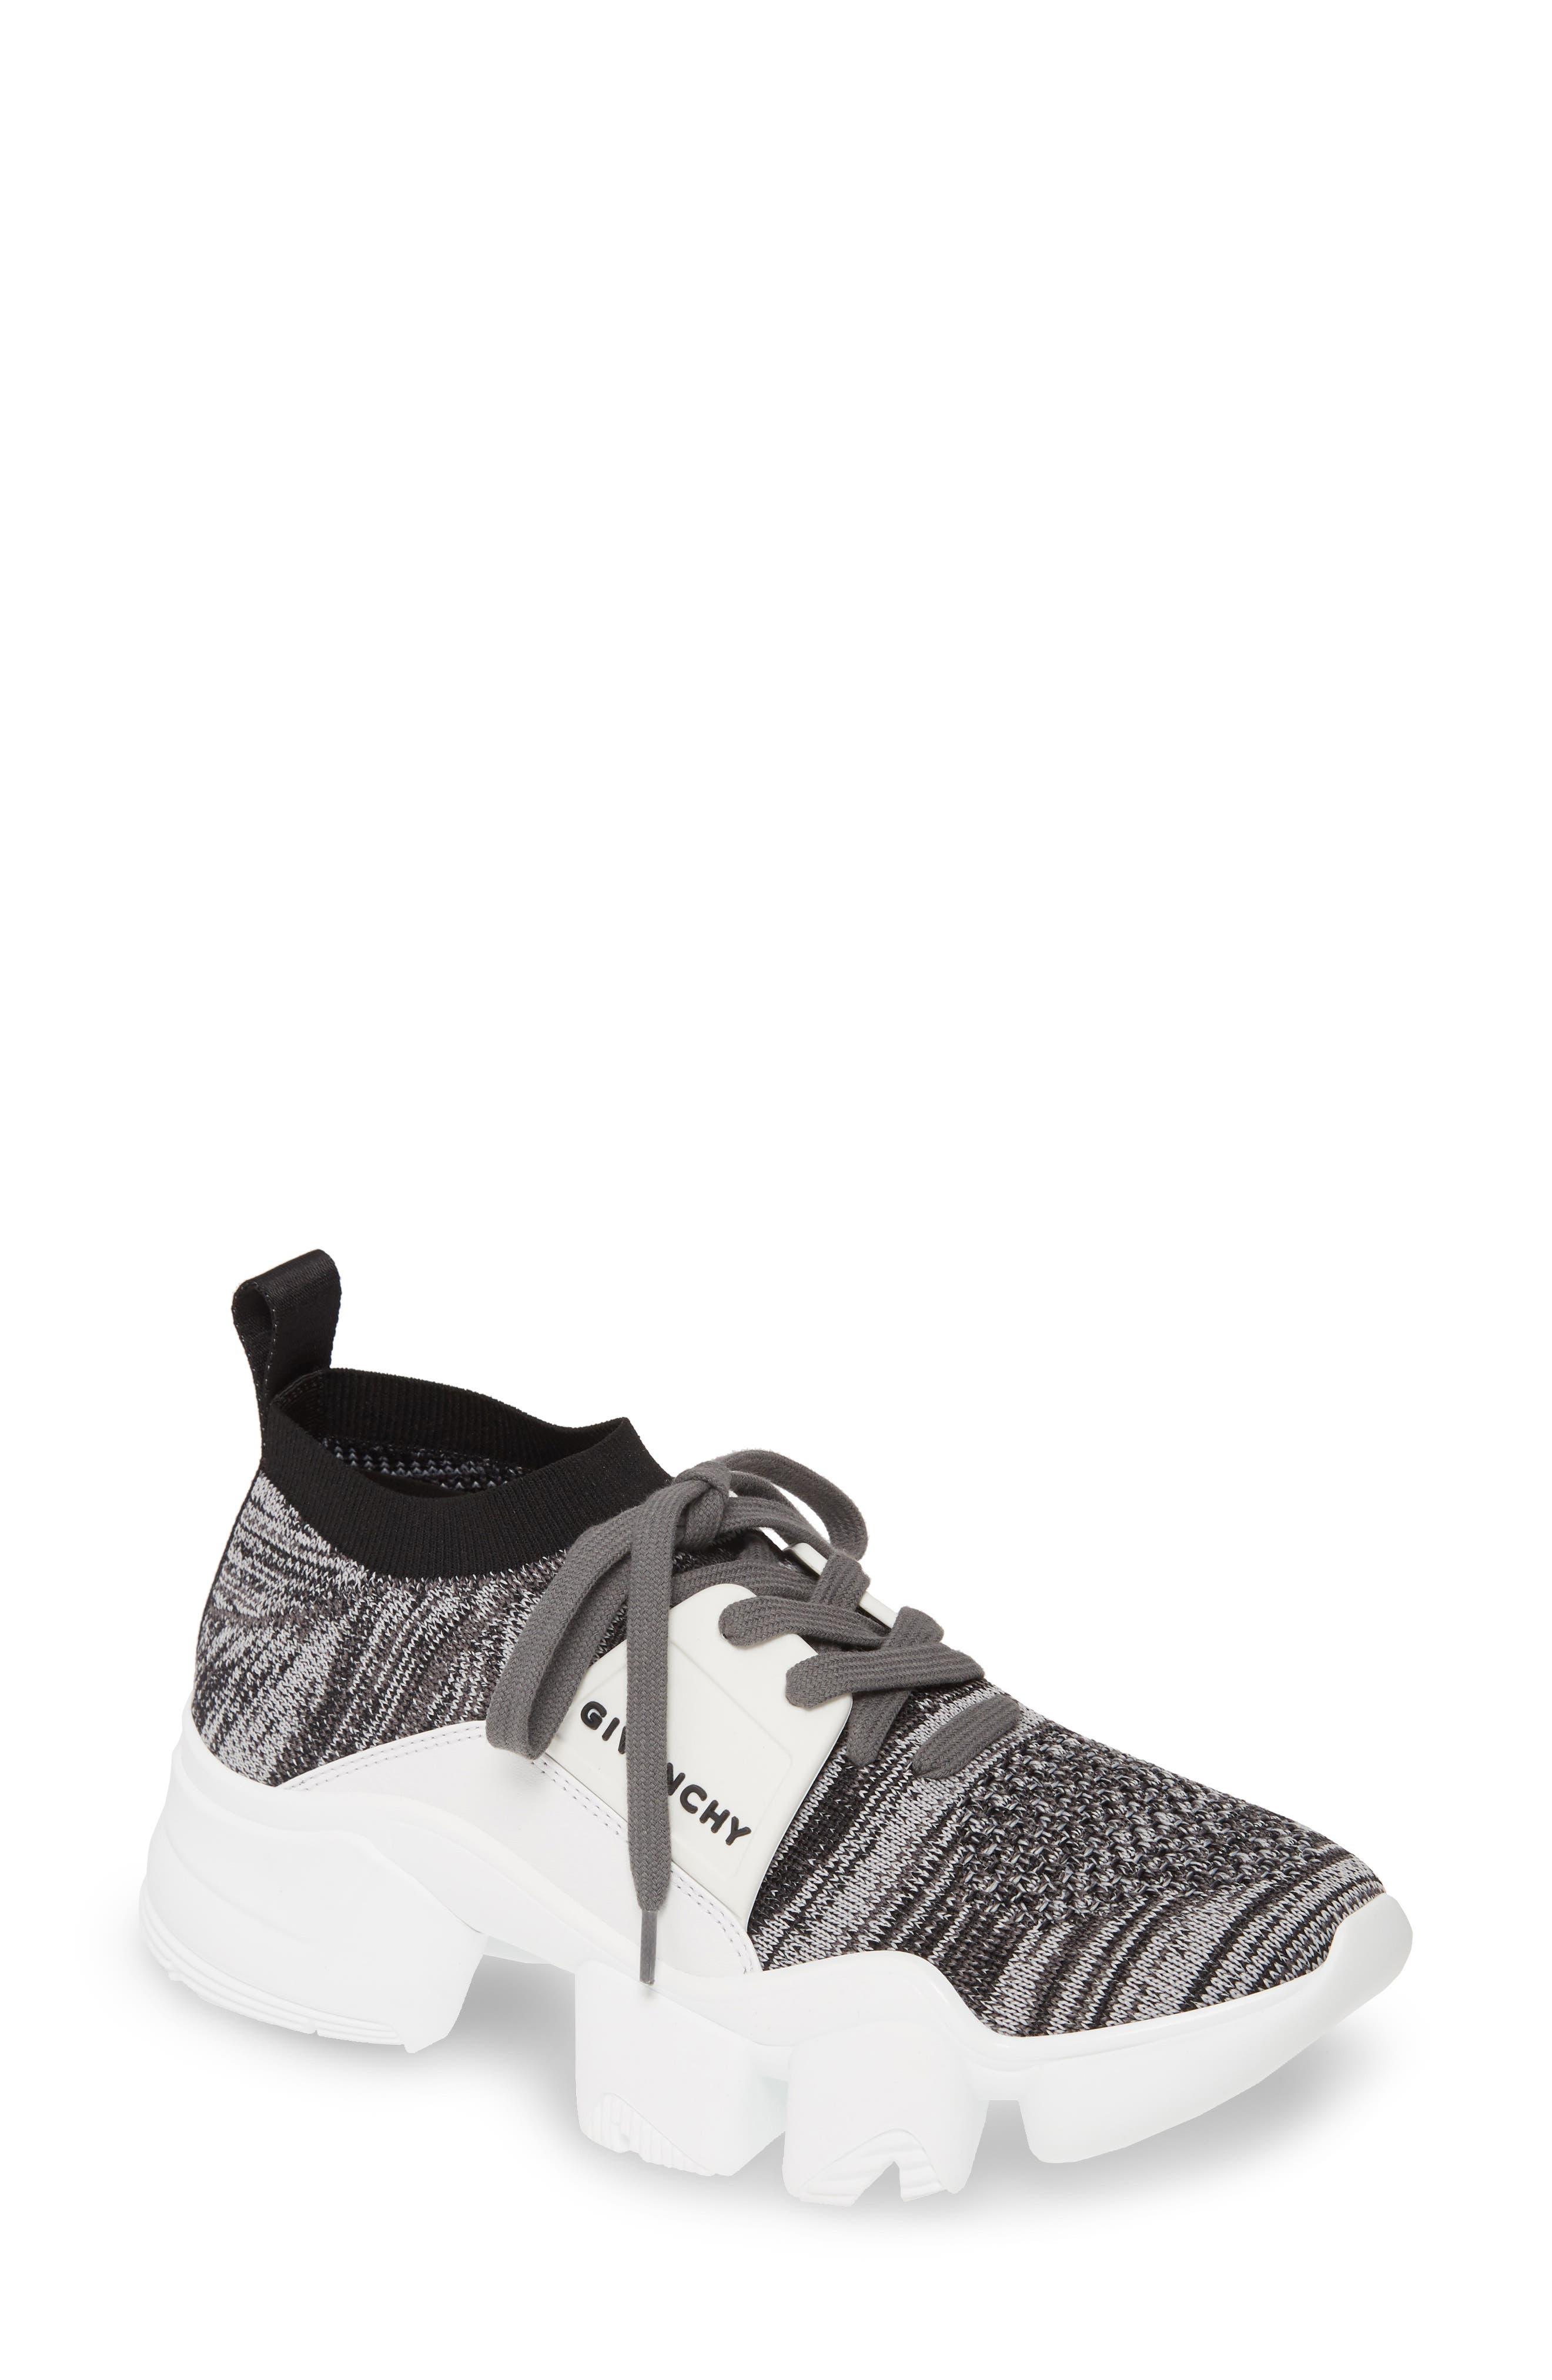 Givenchy Jaw Sock Sneaker (Women